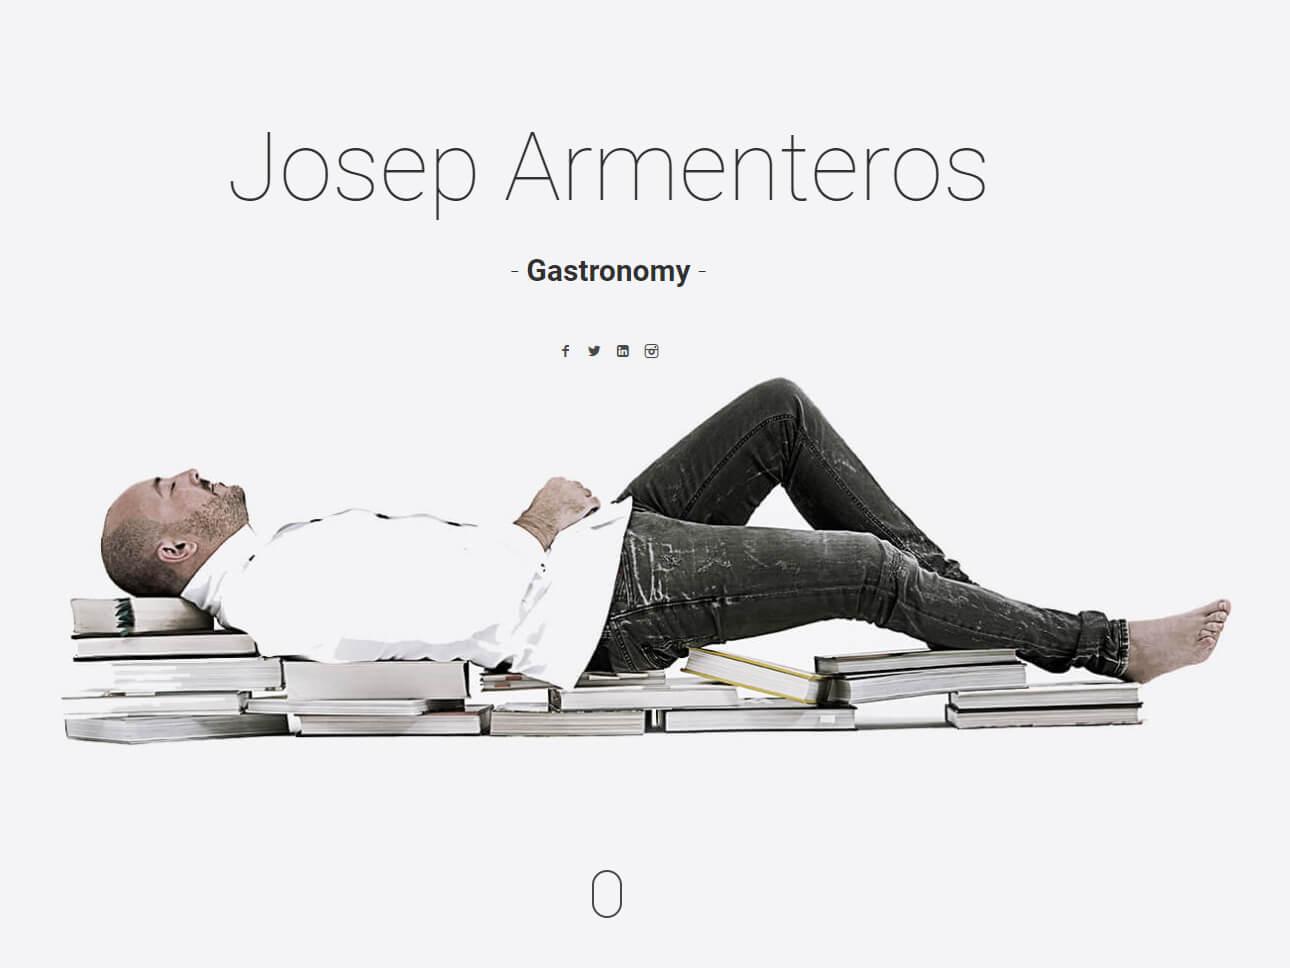 Josep Armenteros Gastronomy (web 01)